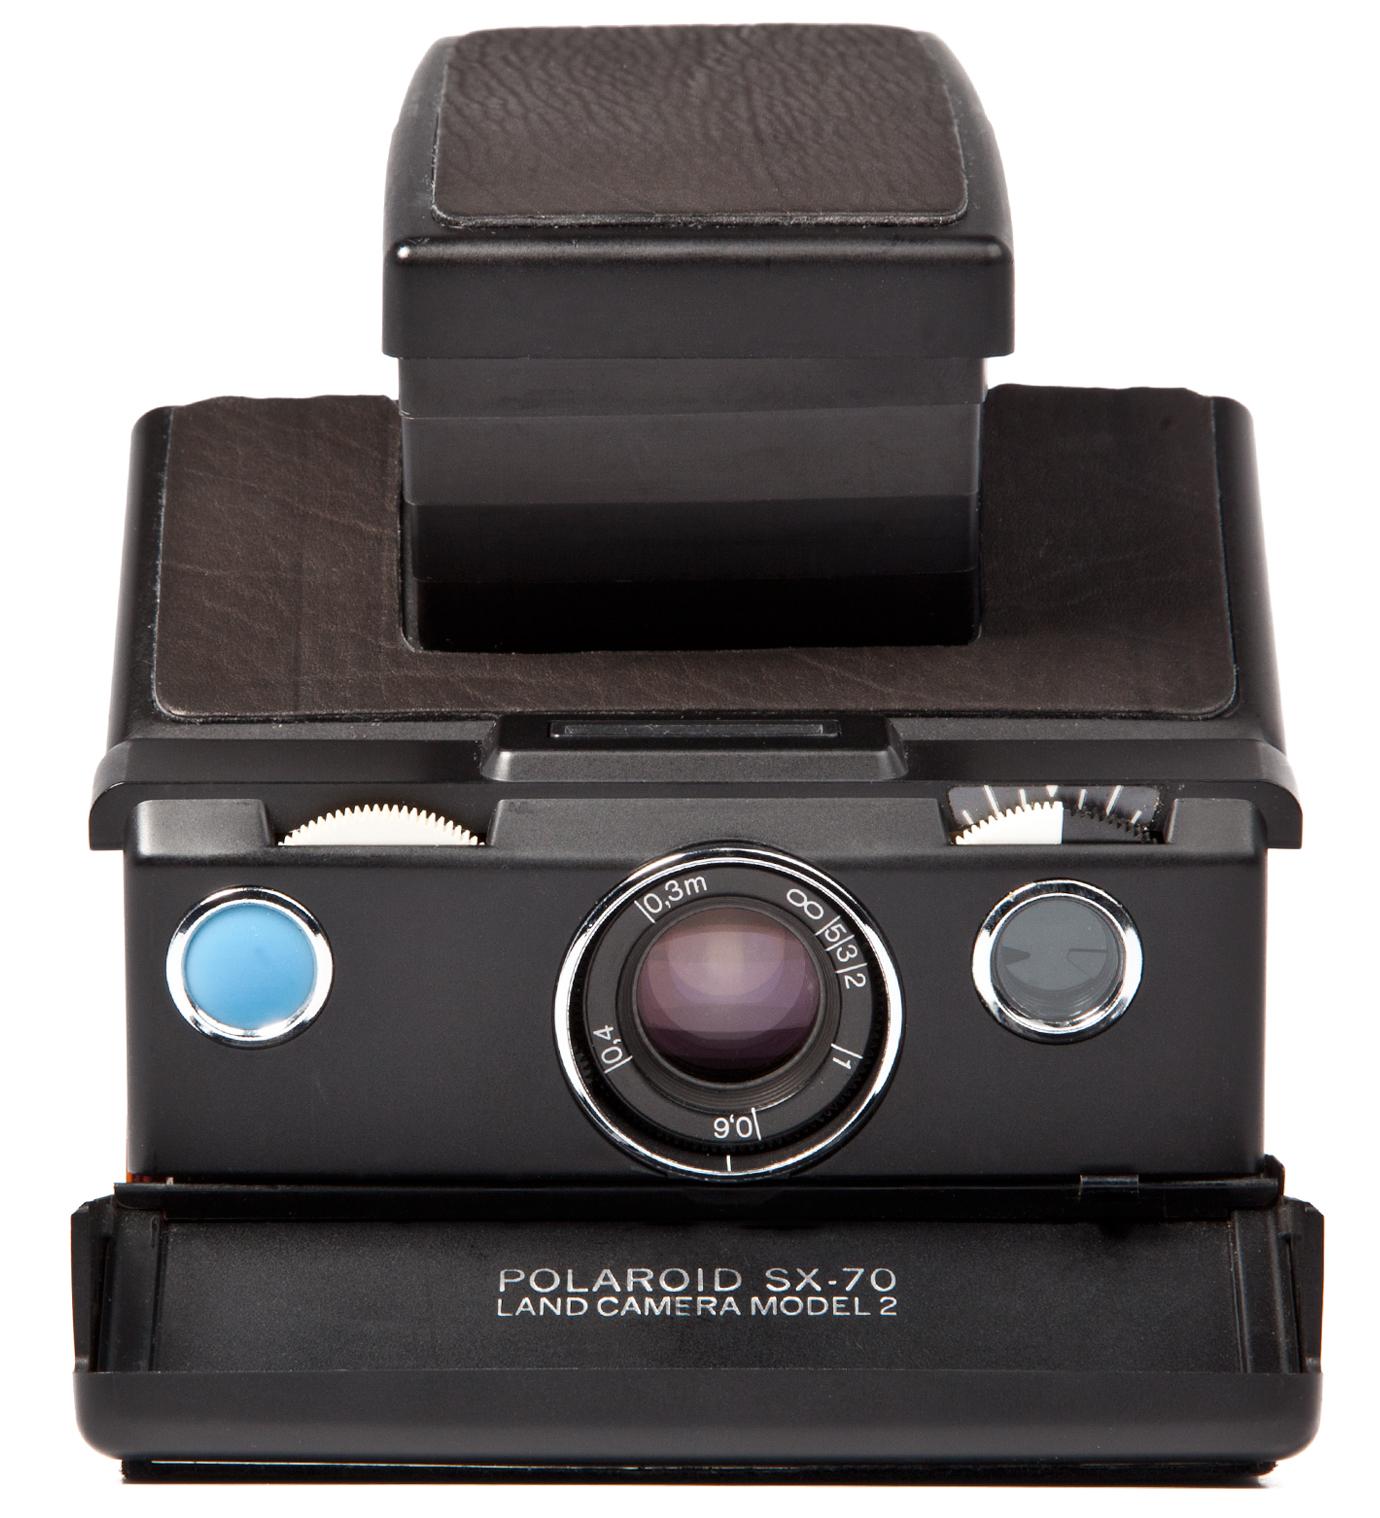 IMPOSSIBLE Black Body Refurbished Vintage Polaroid SX-70 Camera